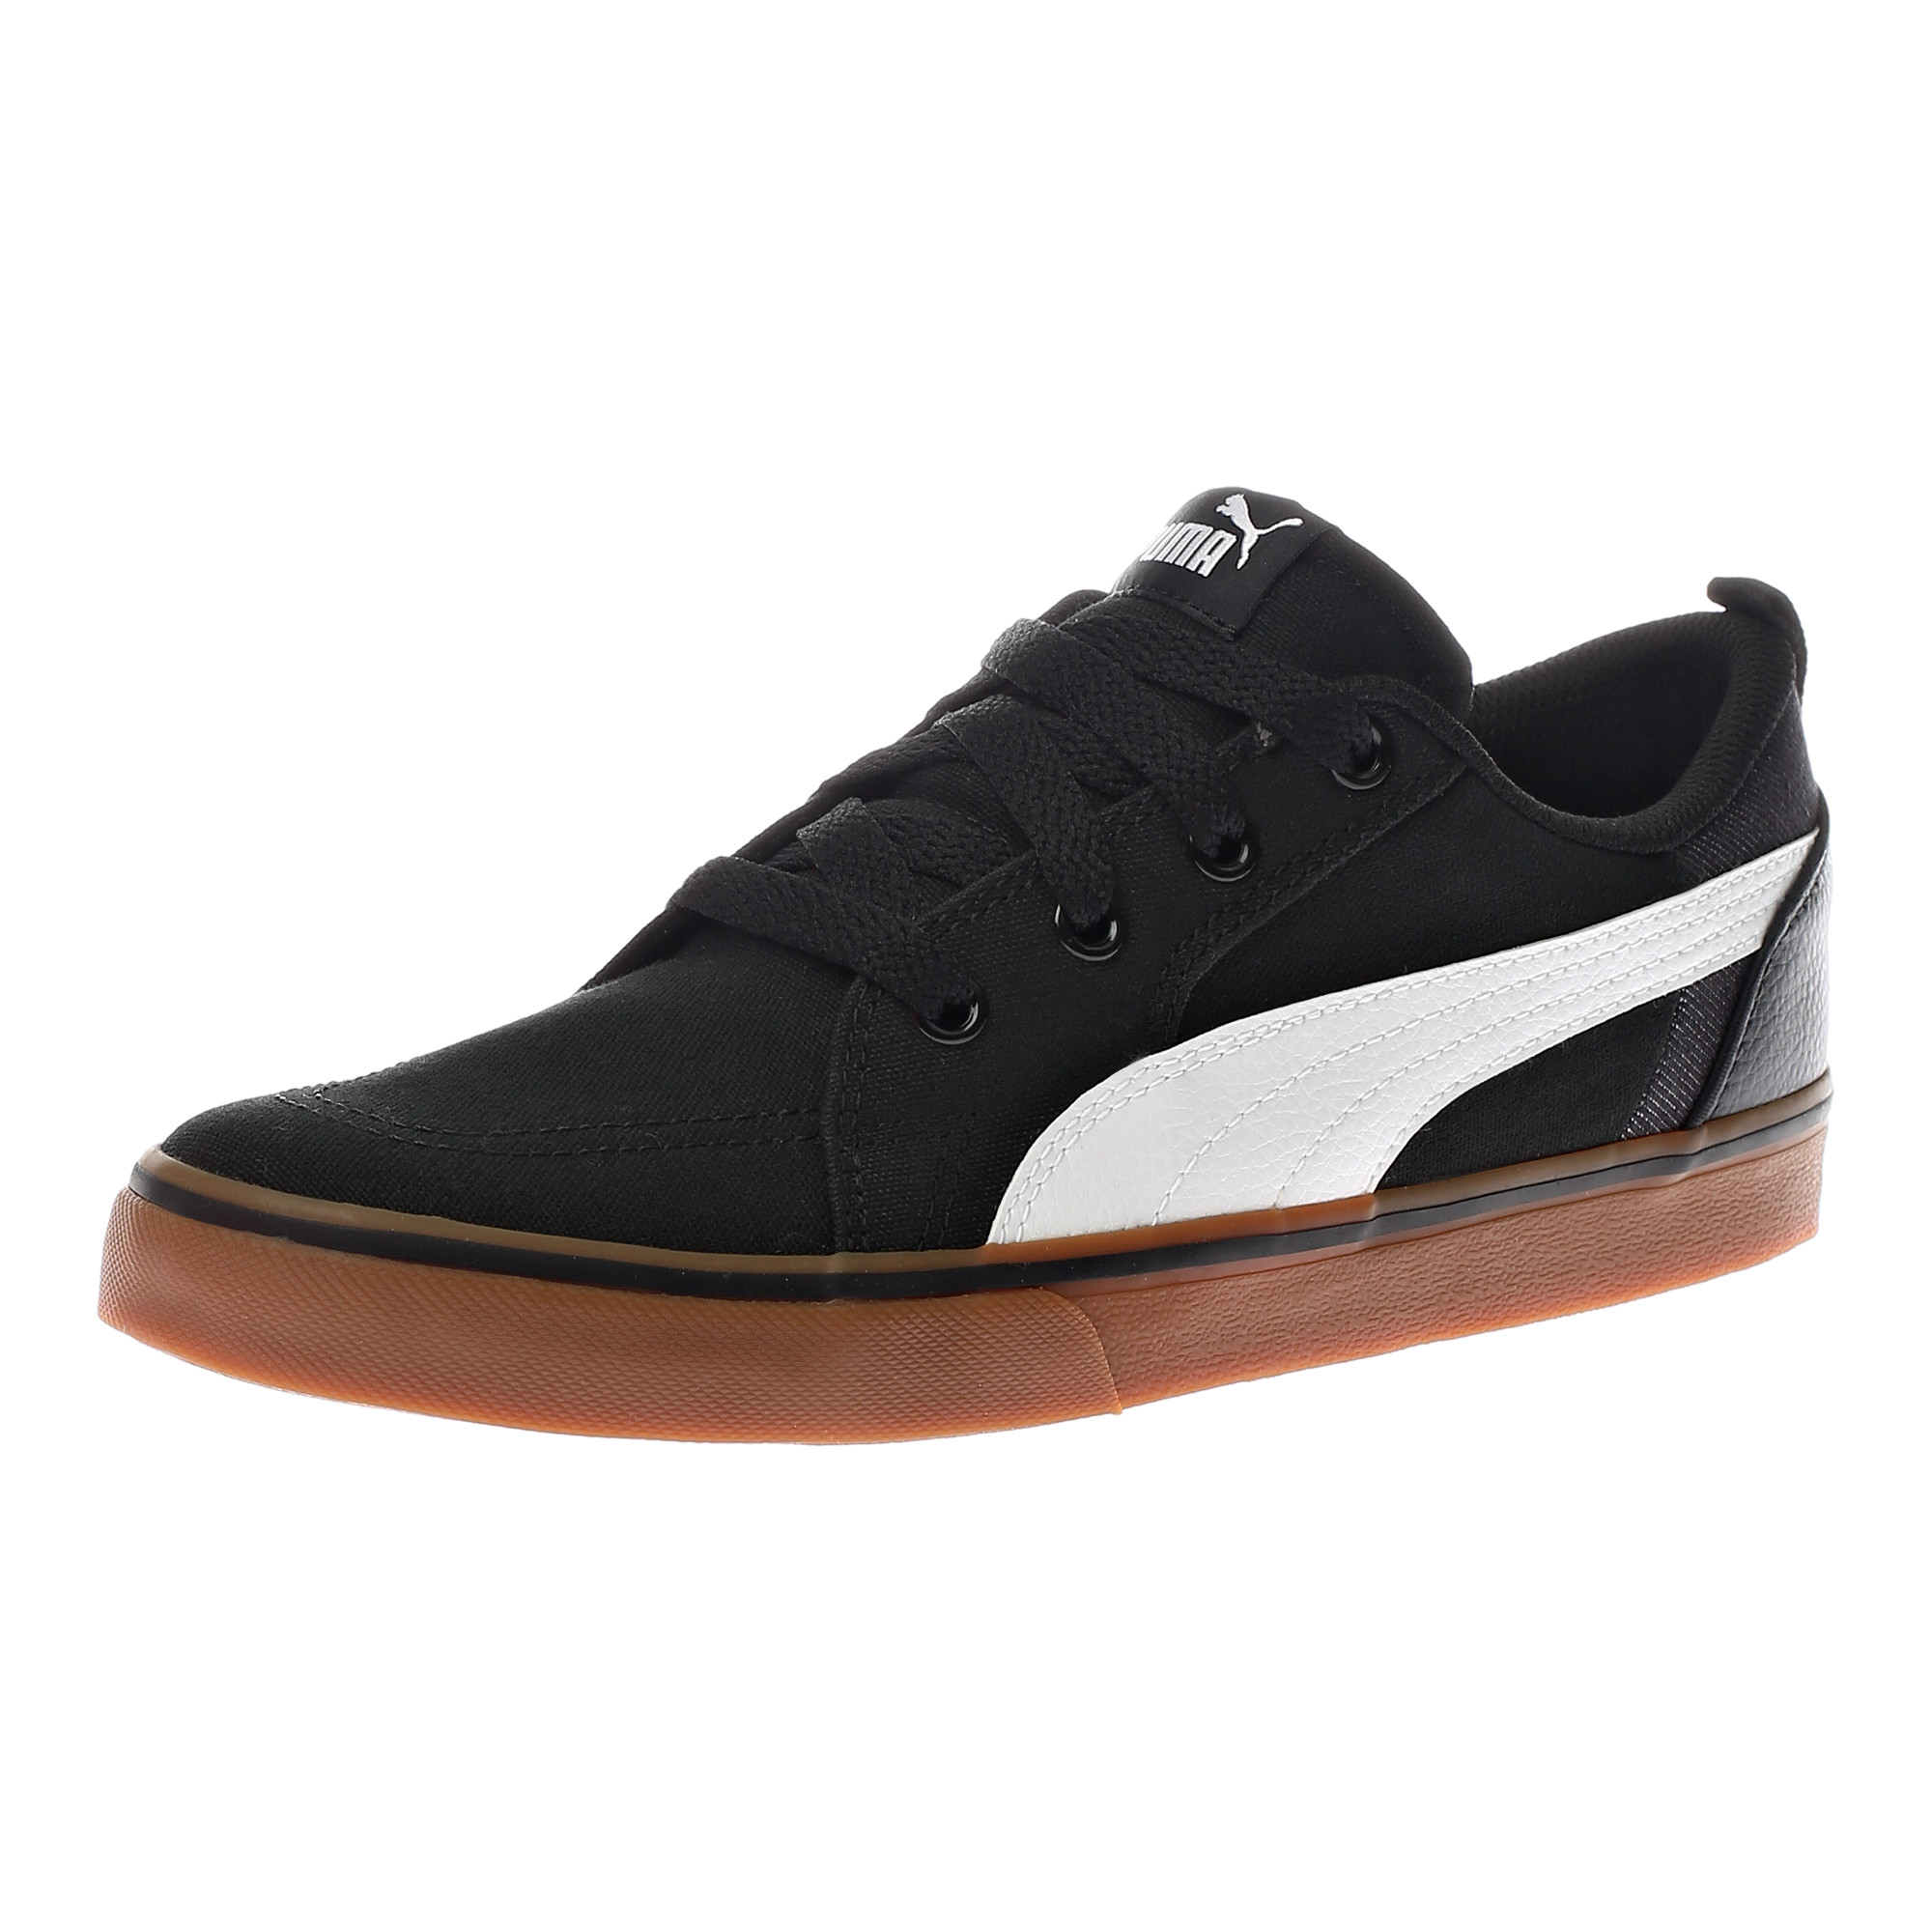 PUMA-PUMA-Bridger-Men-039-s-Sneakers-Men-Shoe-Basics thumbnail 4